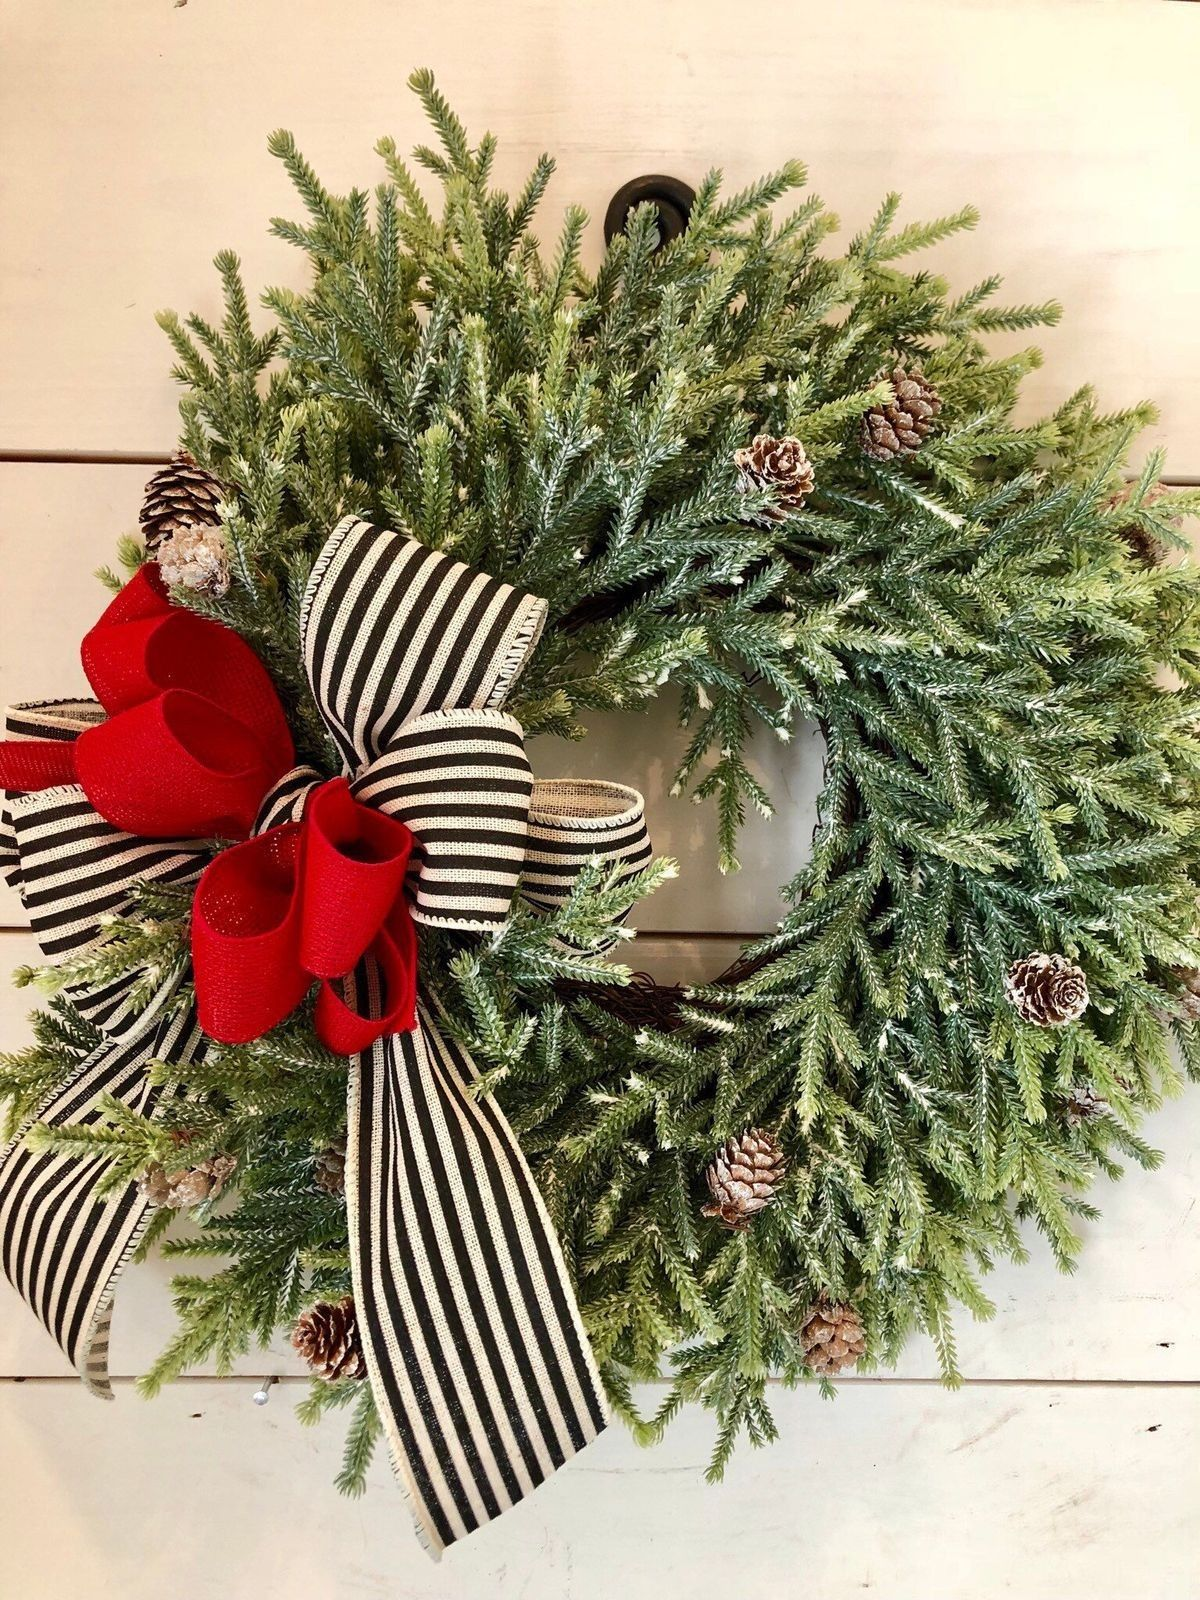 Pin by Joni Dyar on Merry Christmas Pinterest